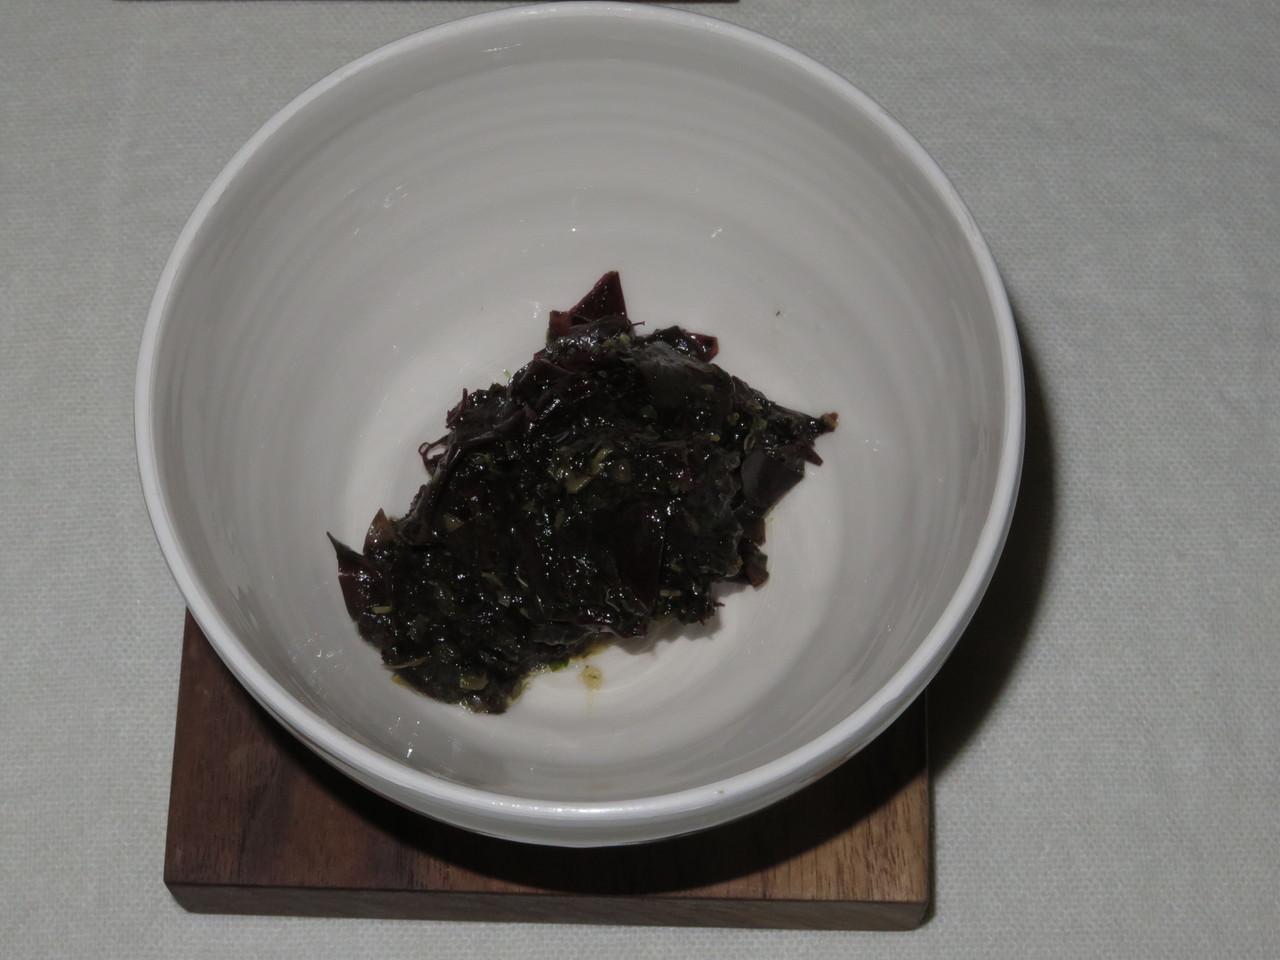 Tártaro de algas